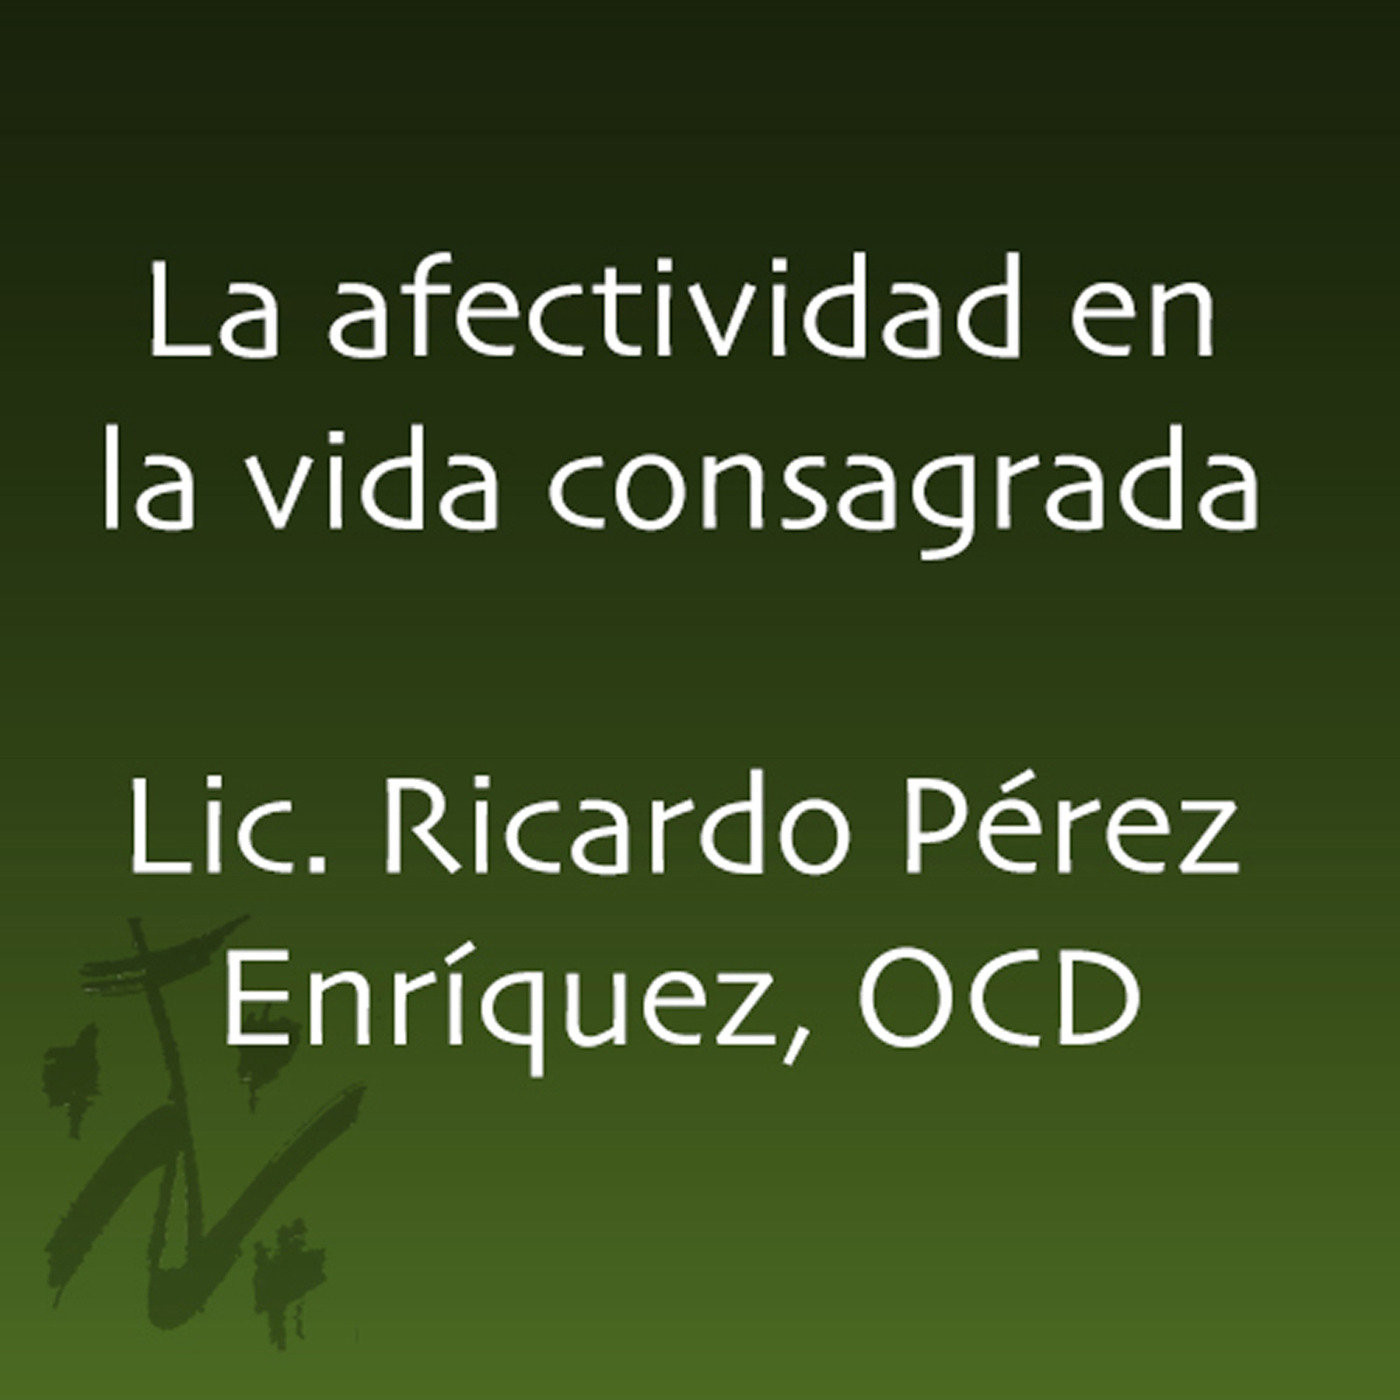 <![CDATA[Afectividad - Ricardo Pérez Enríquez, OCD]]>